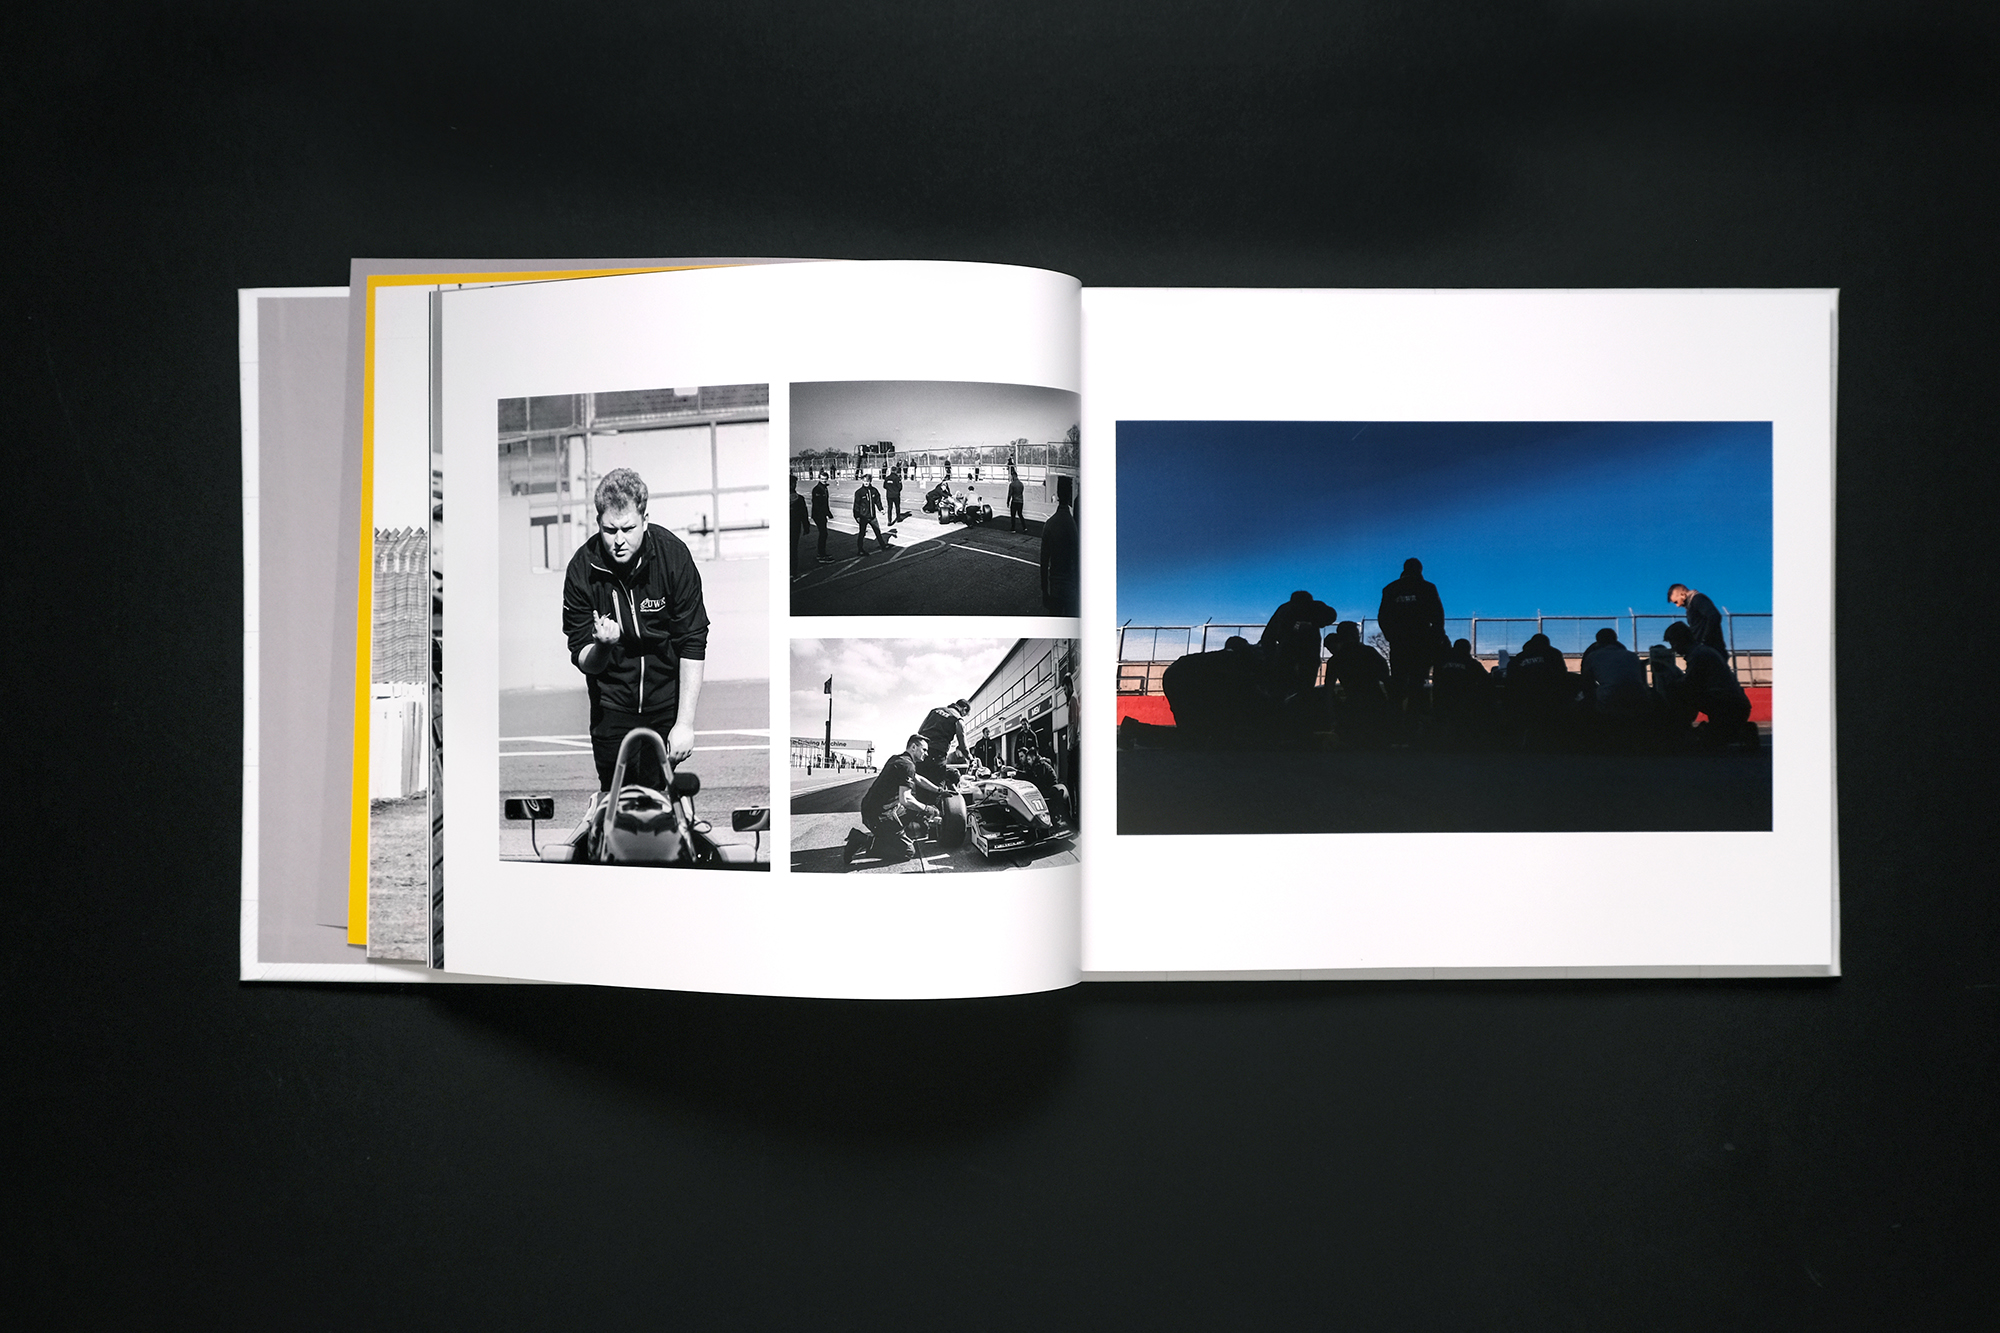 http://rusyndesign.co.uk/wp-content/uploads/2020/04/UWR-19-book-shots-06.jpg